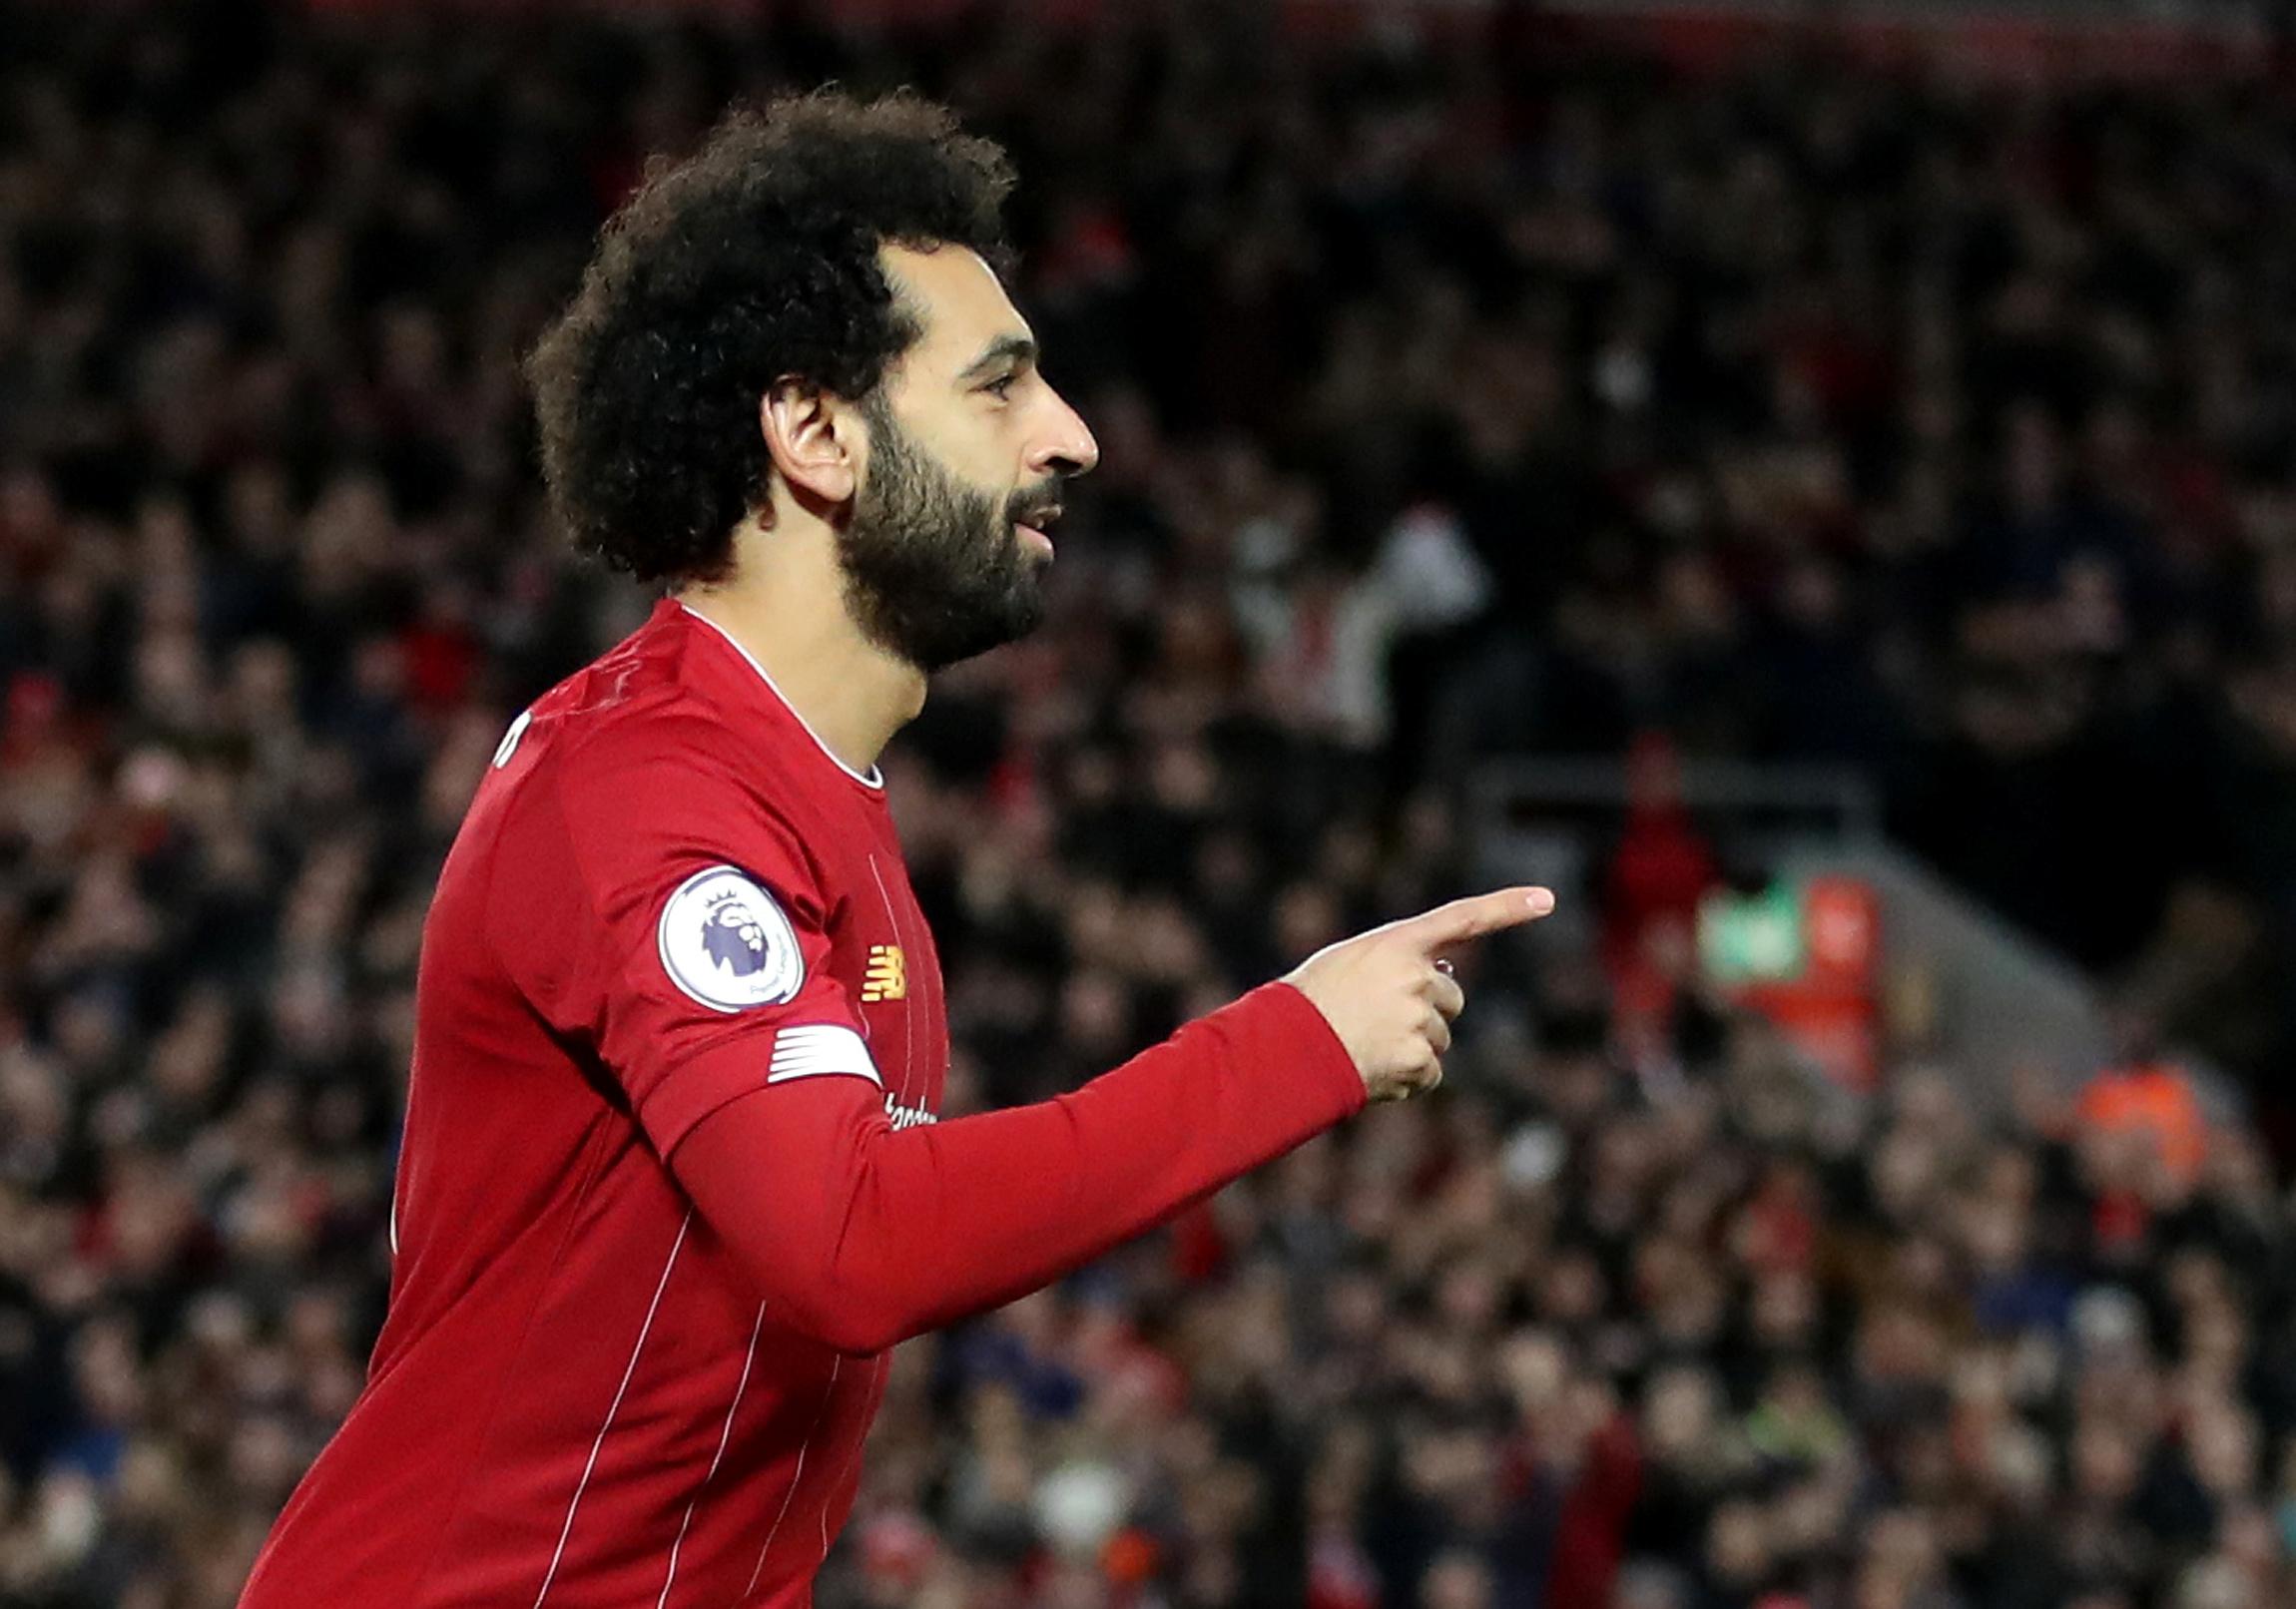 Mohamed Salah, egipcio de 27 años, Liverpool- USD 195,2